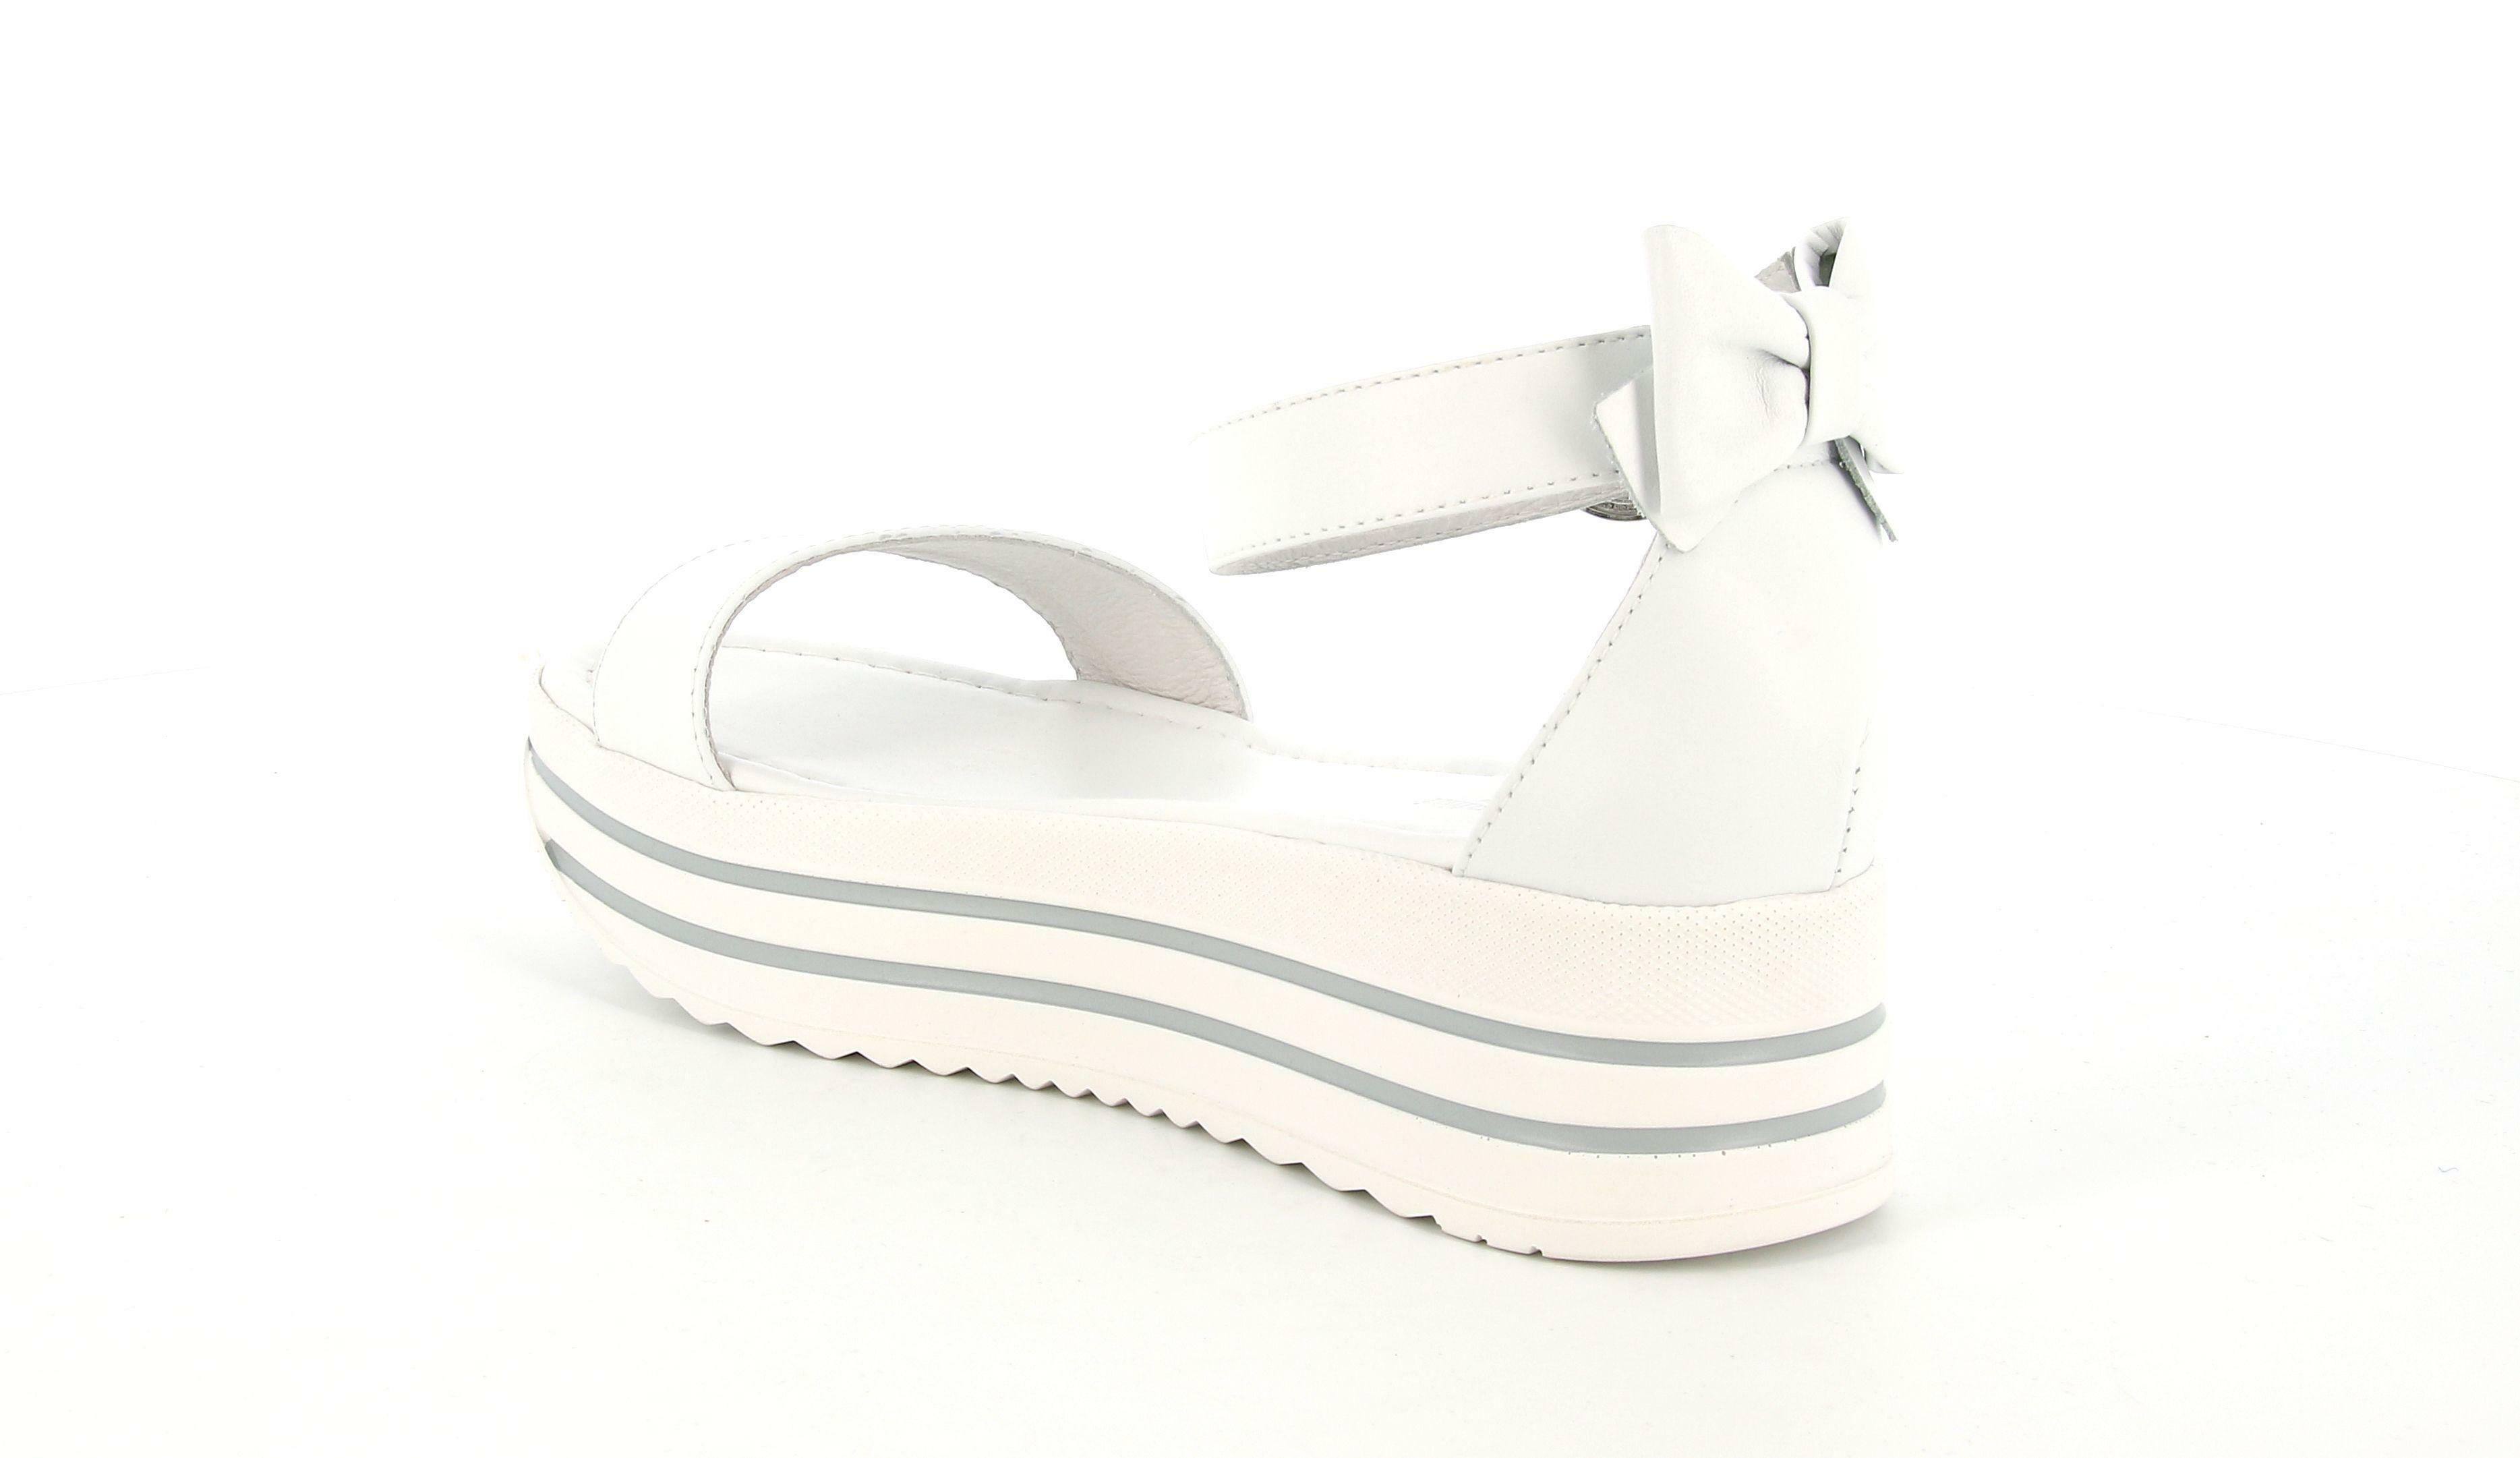 nero giardini nero giardini sandalo zeppa donna e012591d 707 bianco